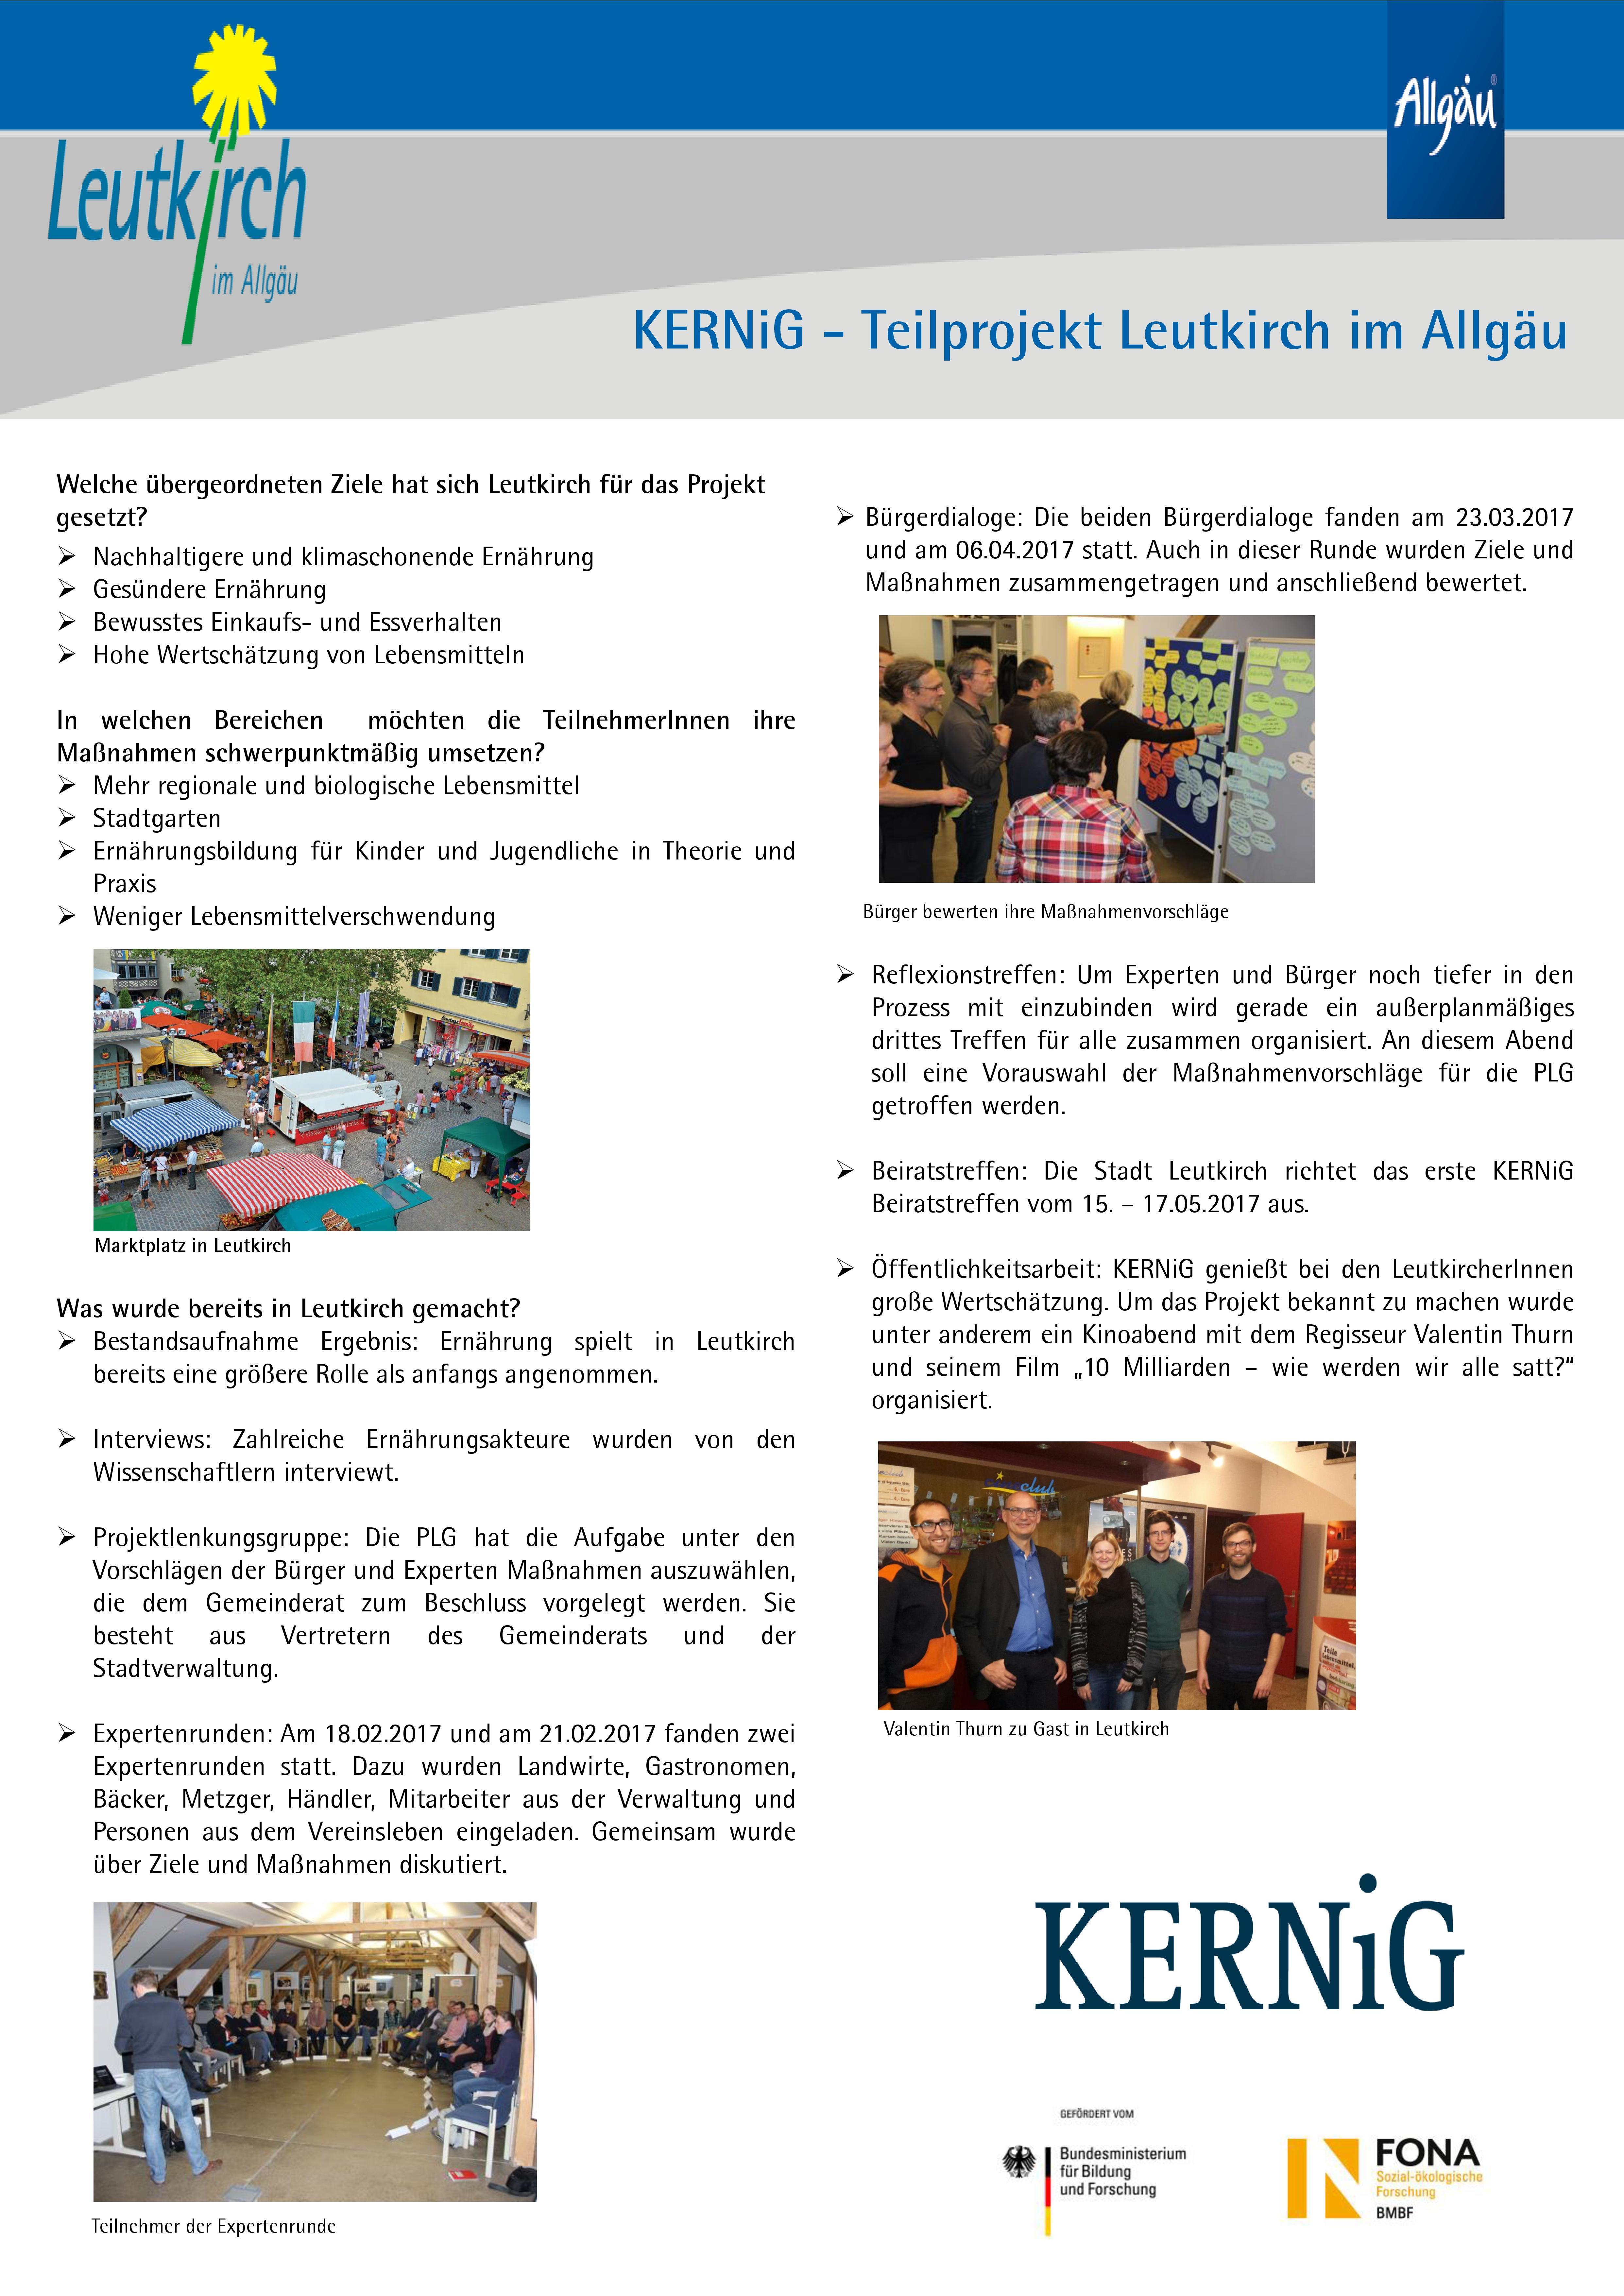 poster-leutkirch-bild.jpg — Sustainability and Environmental Governance